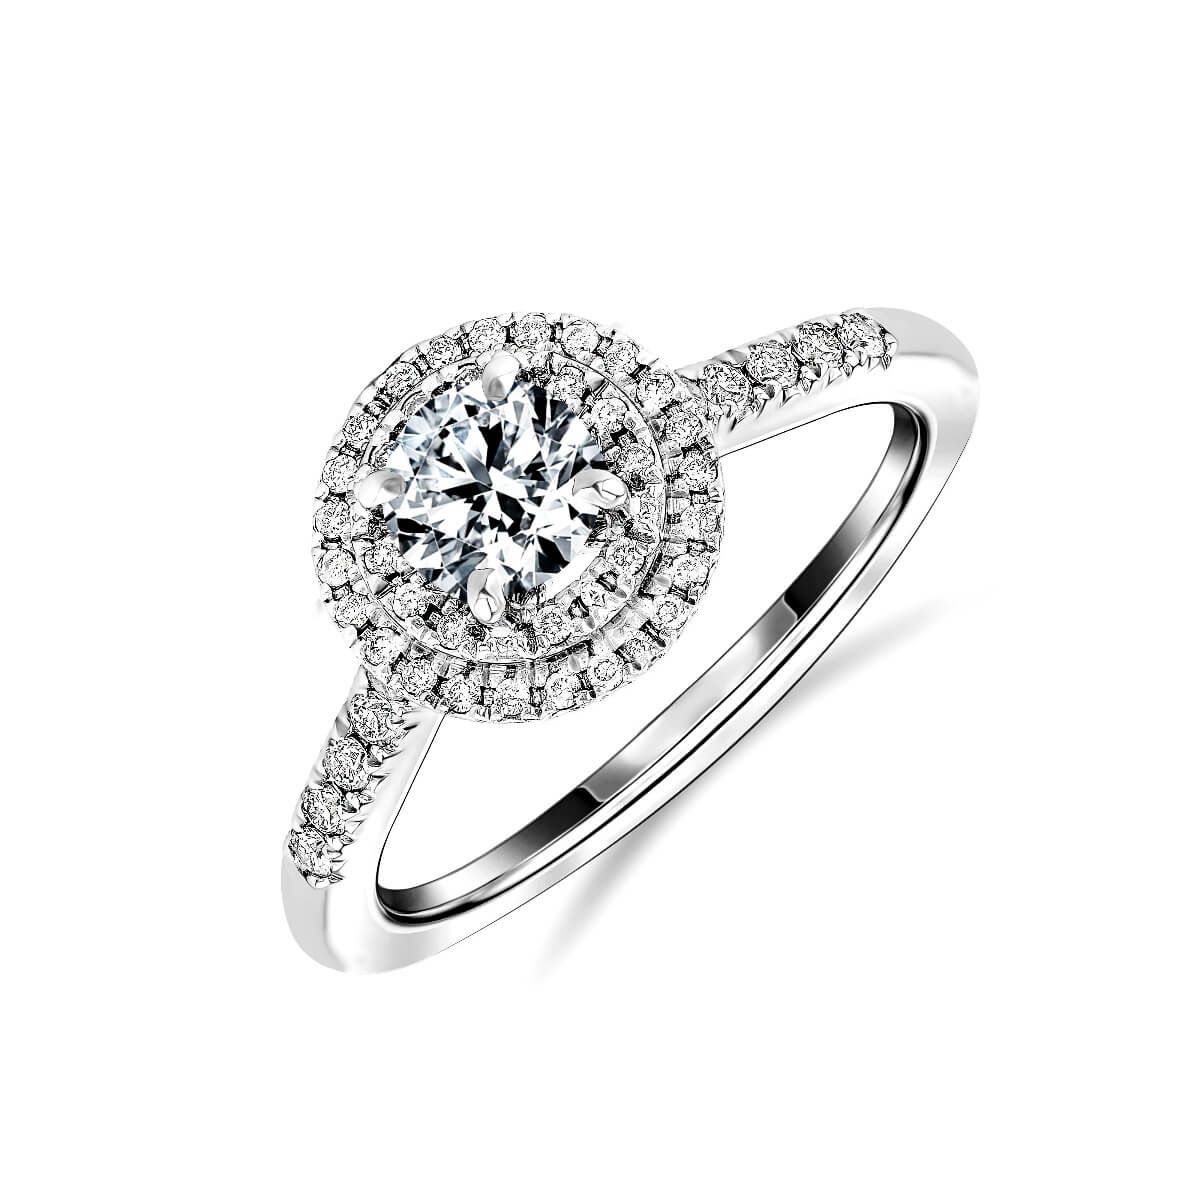 0.83ct Peony Halo | Round Cut Diamond Double Halo Engagement Ring | 18K White Gold